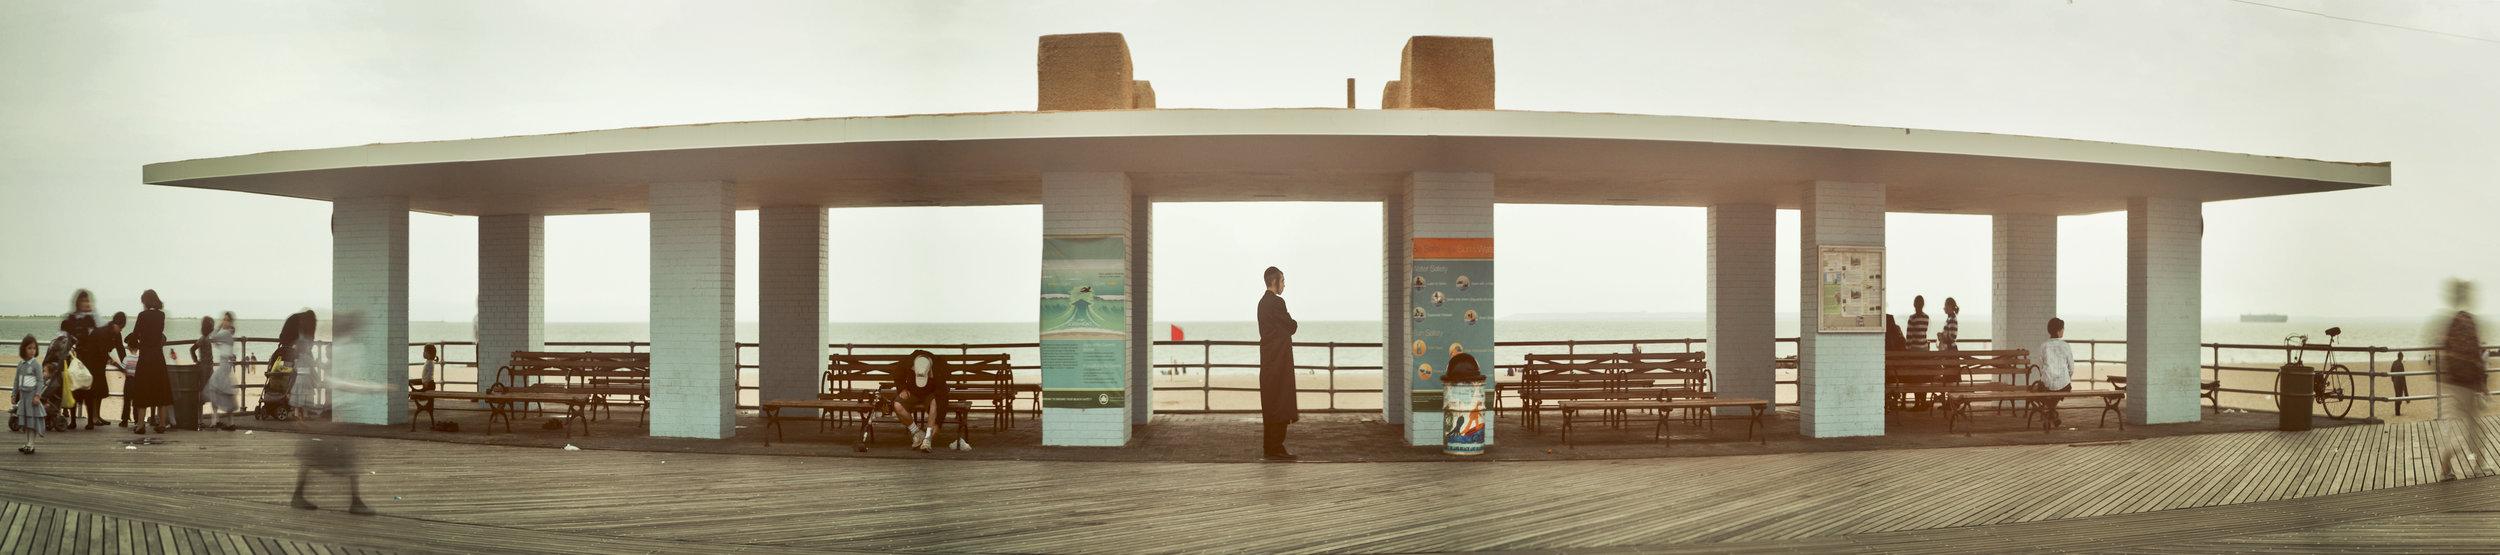 Coney Island-8.jpg